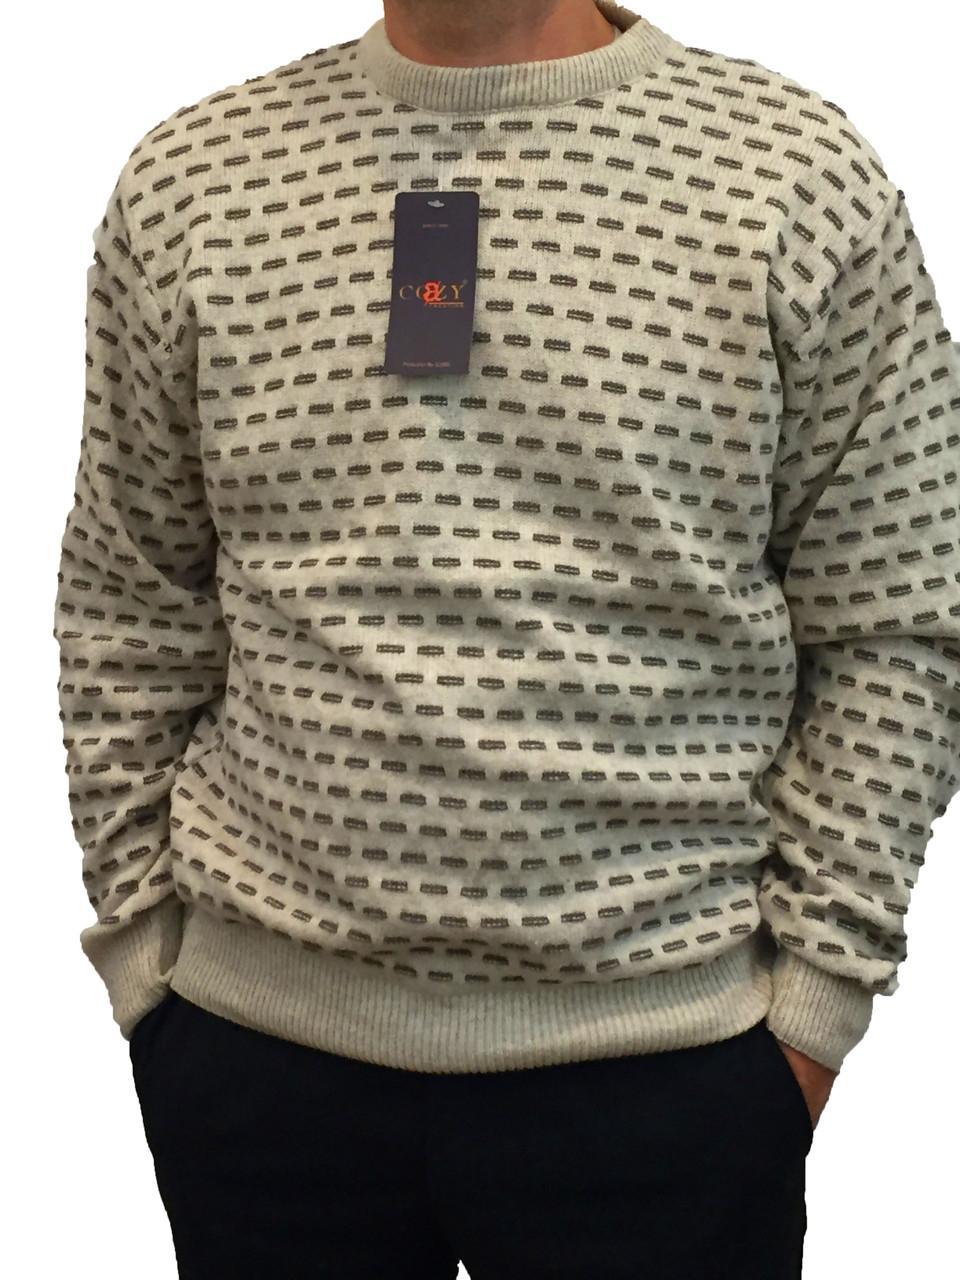 Мужской теплый свитер № 1695 беж